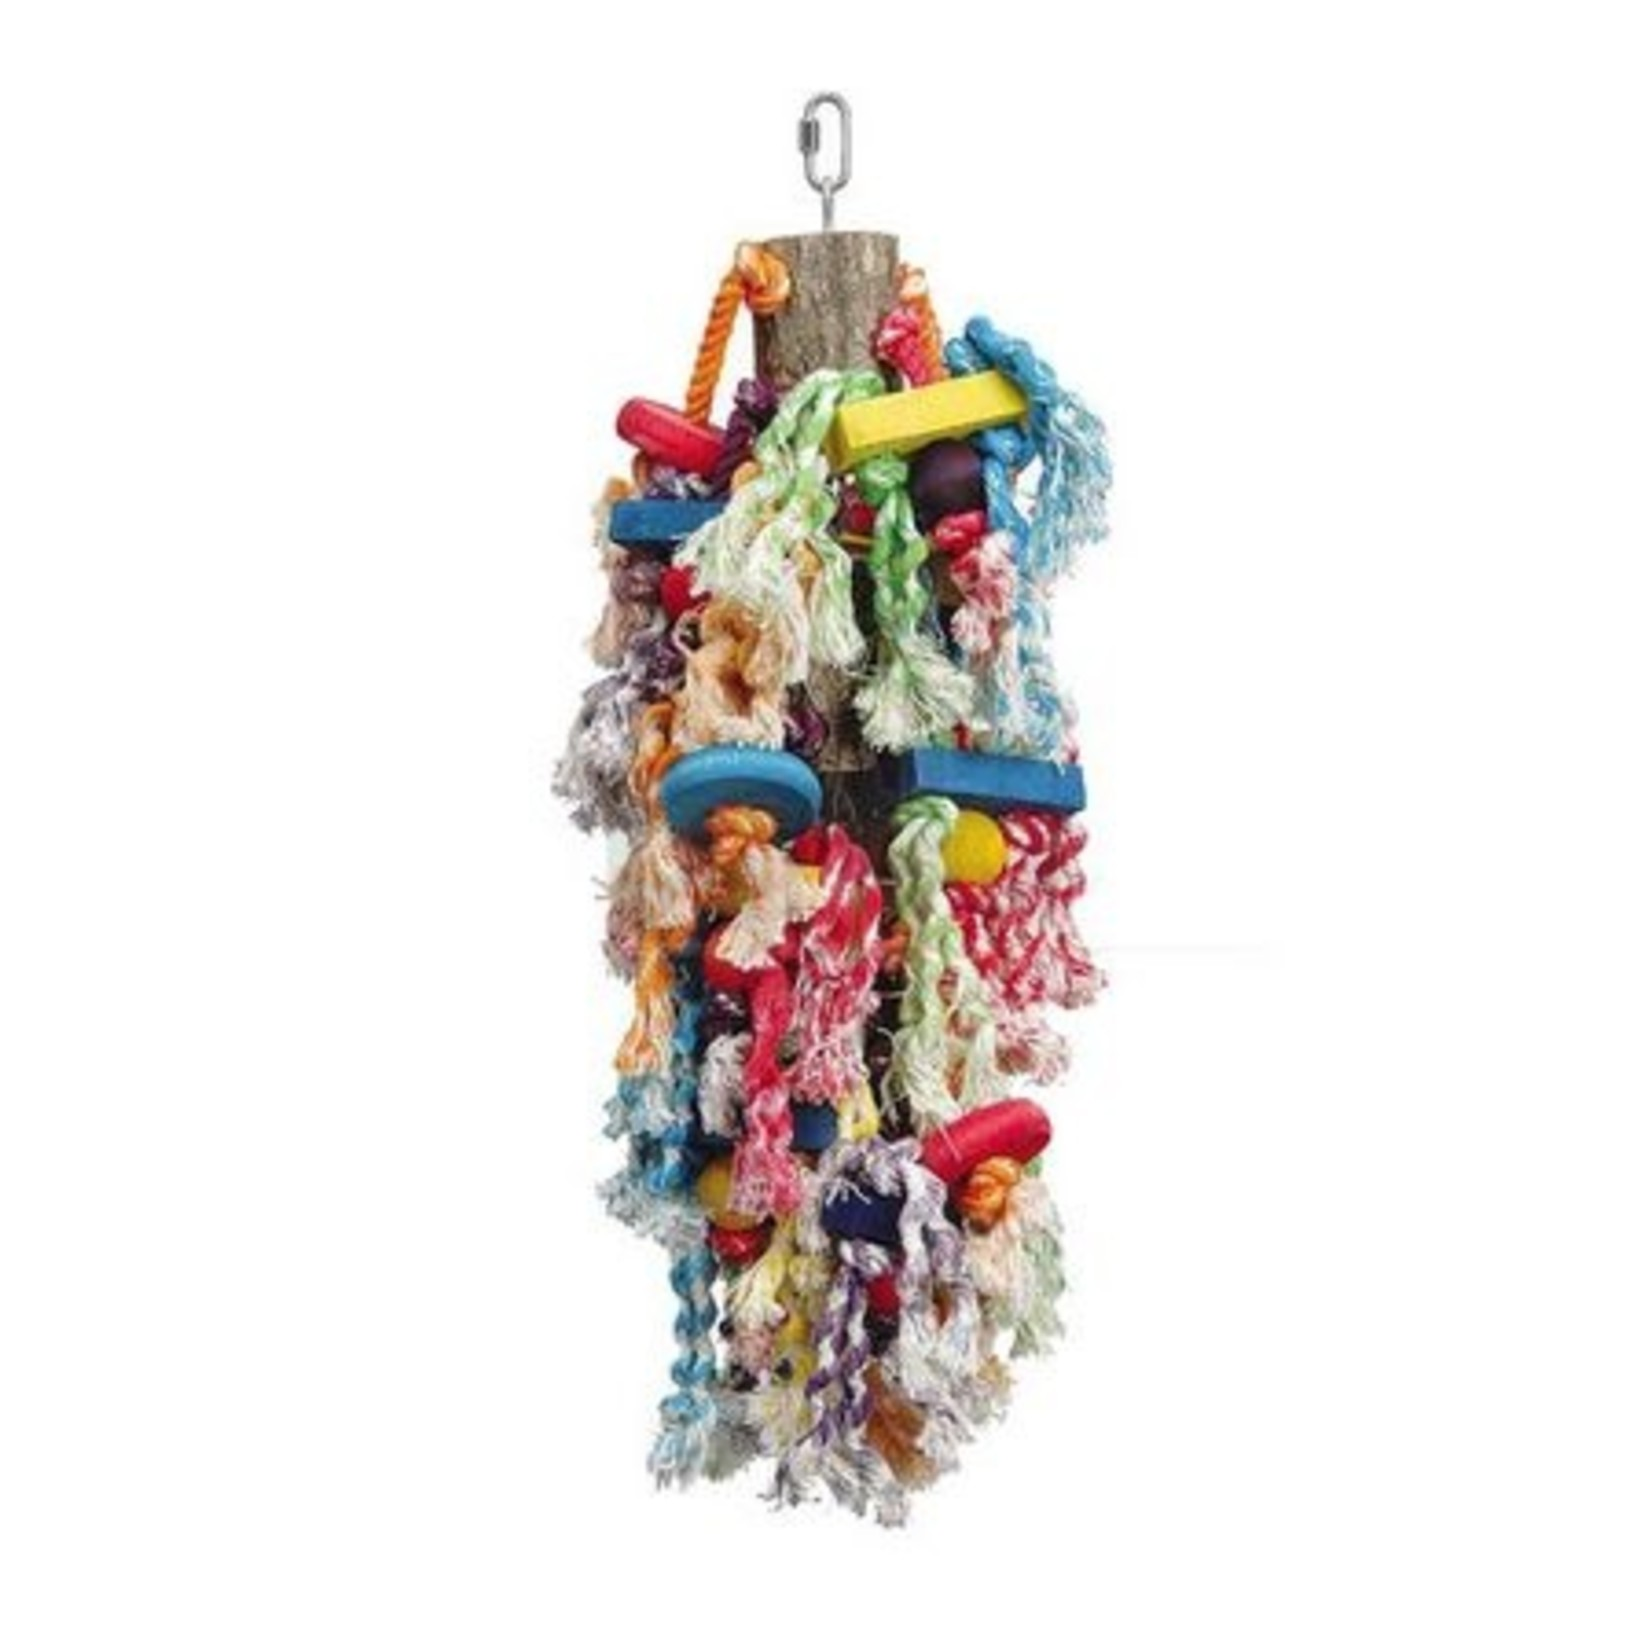 Vogelspeelgoed, papegaaienspeelgoed  Chili